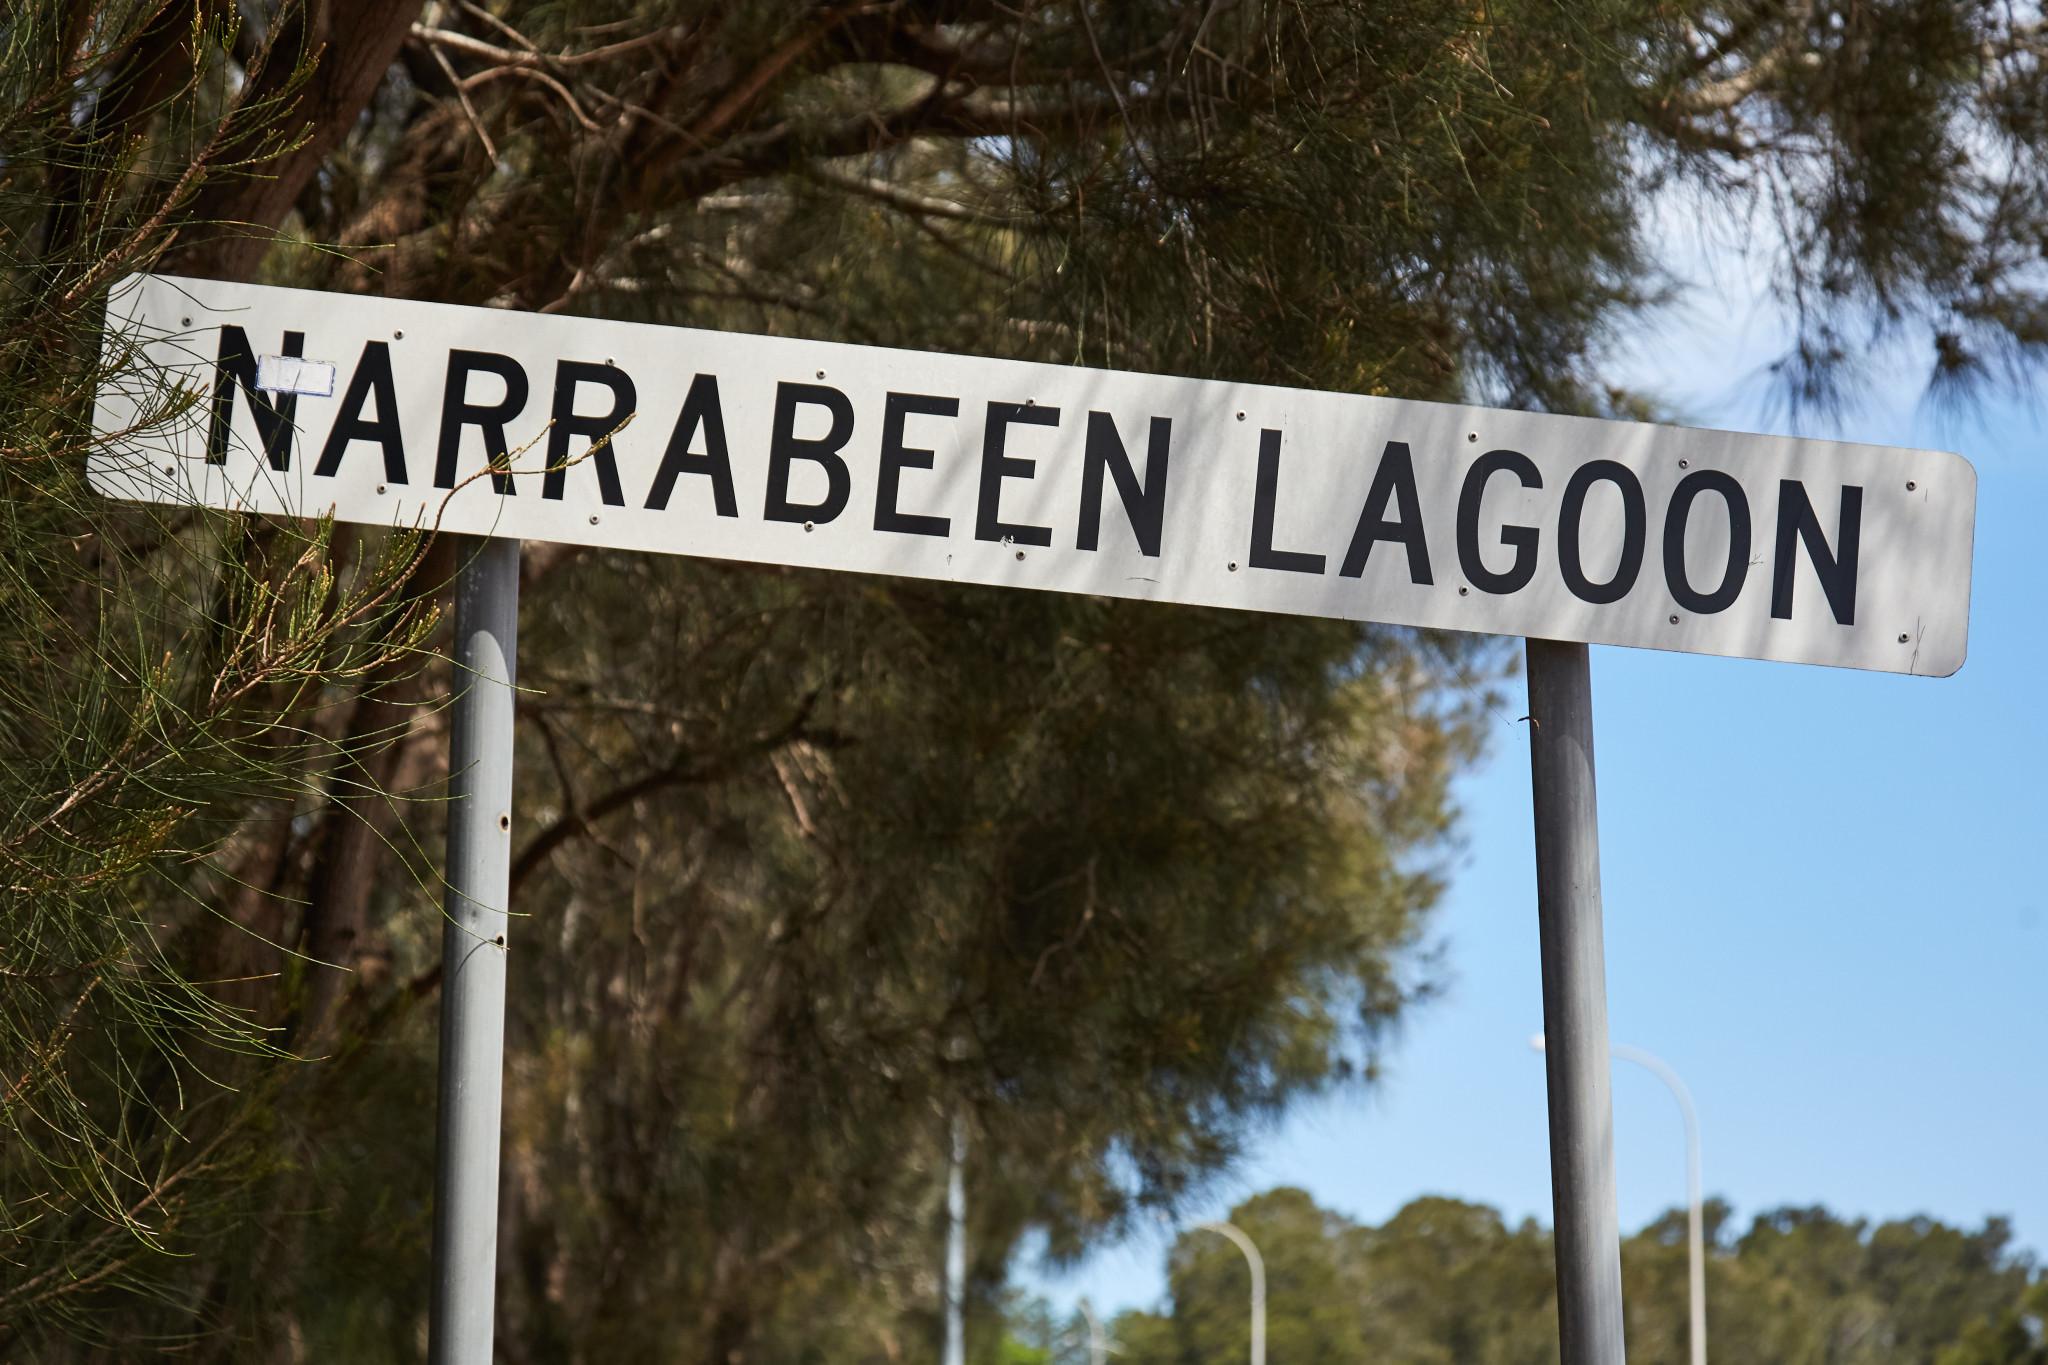 Delayed start for WSL Championship Tour leg in Narrabeen